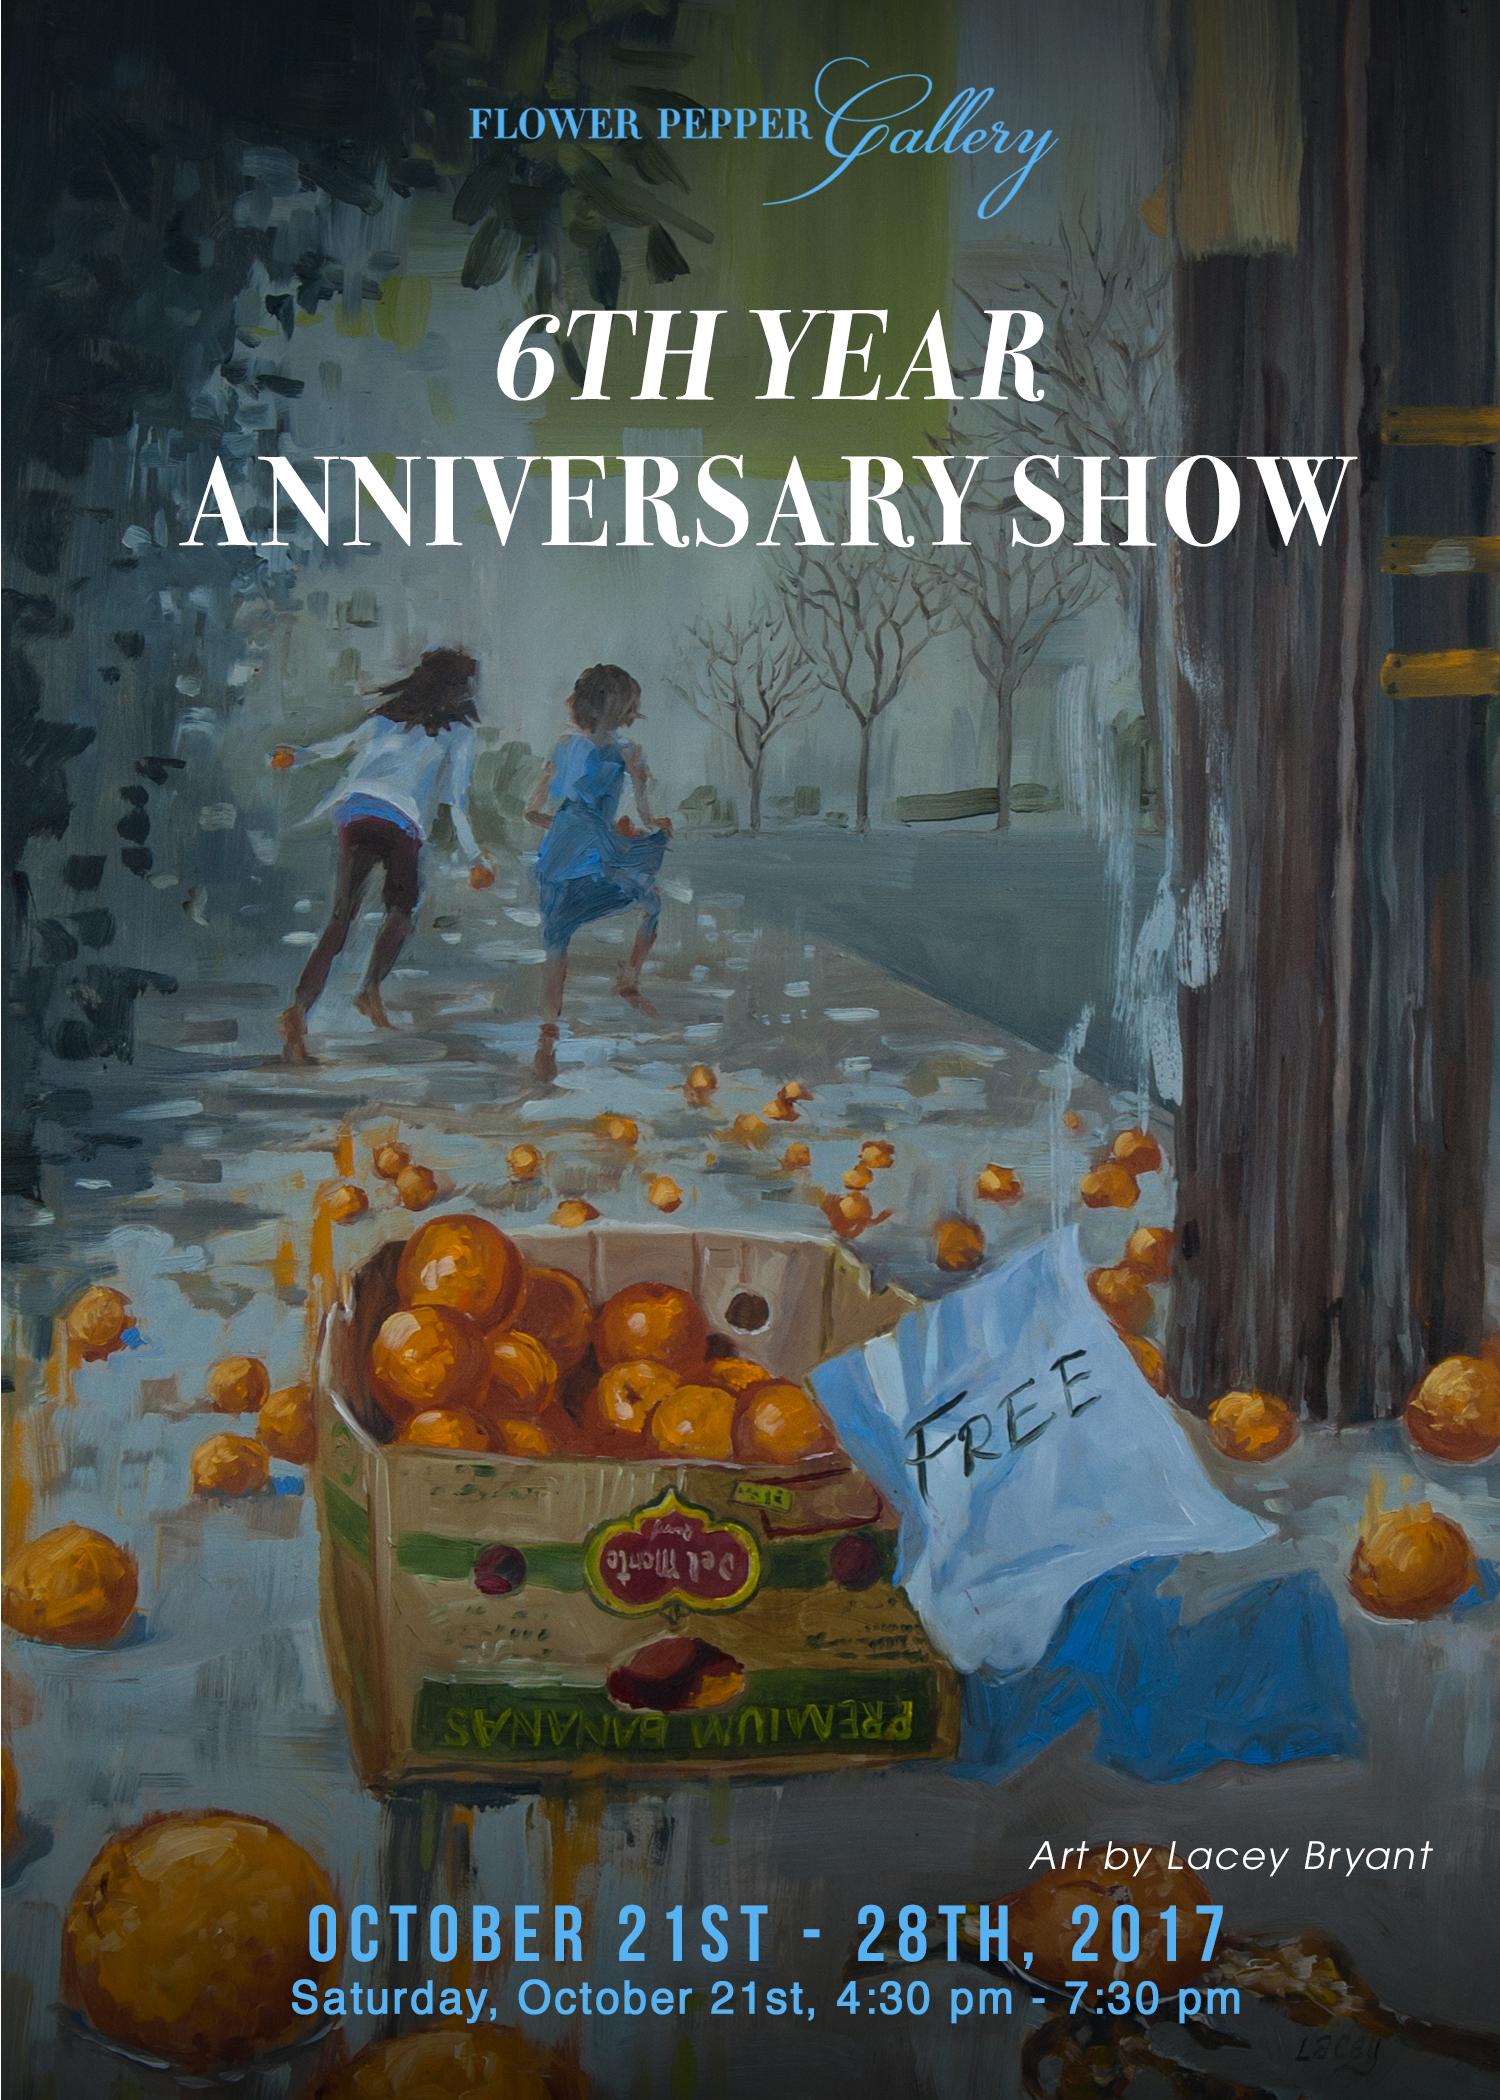 6th Year Anniversary Show